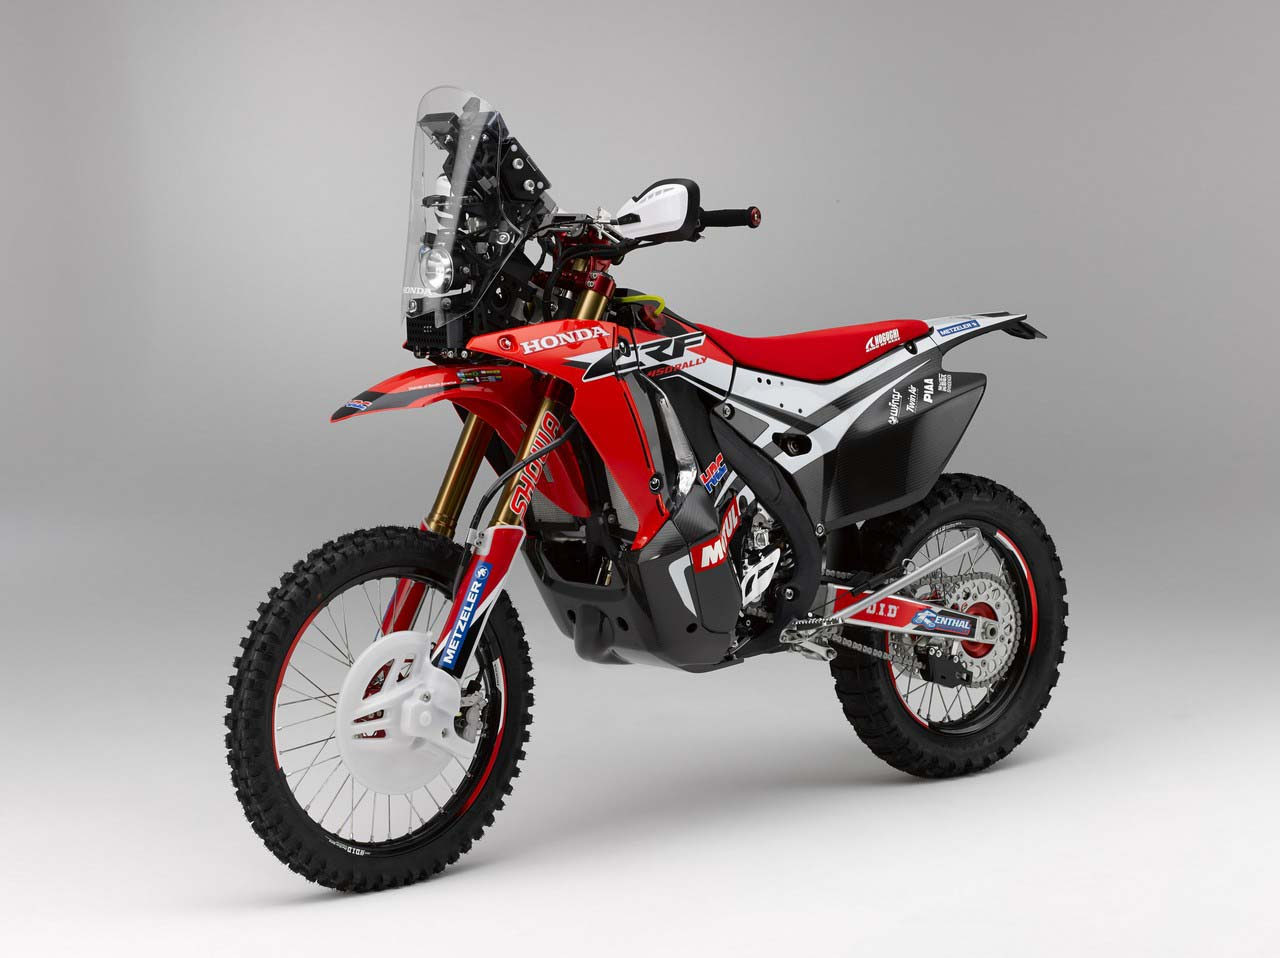 Enduro R Specs >> HRC Shows Off the 2014 Honda CRF450 Rally Race Bike - Asphalt & Rubber